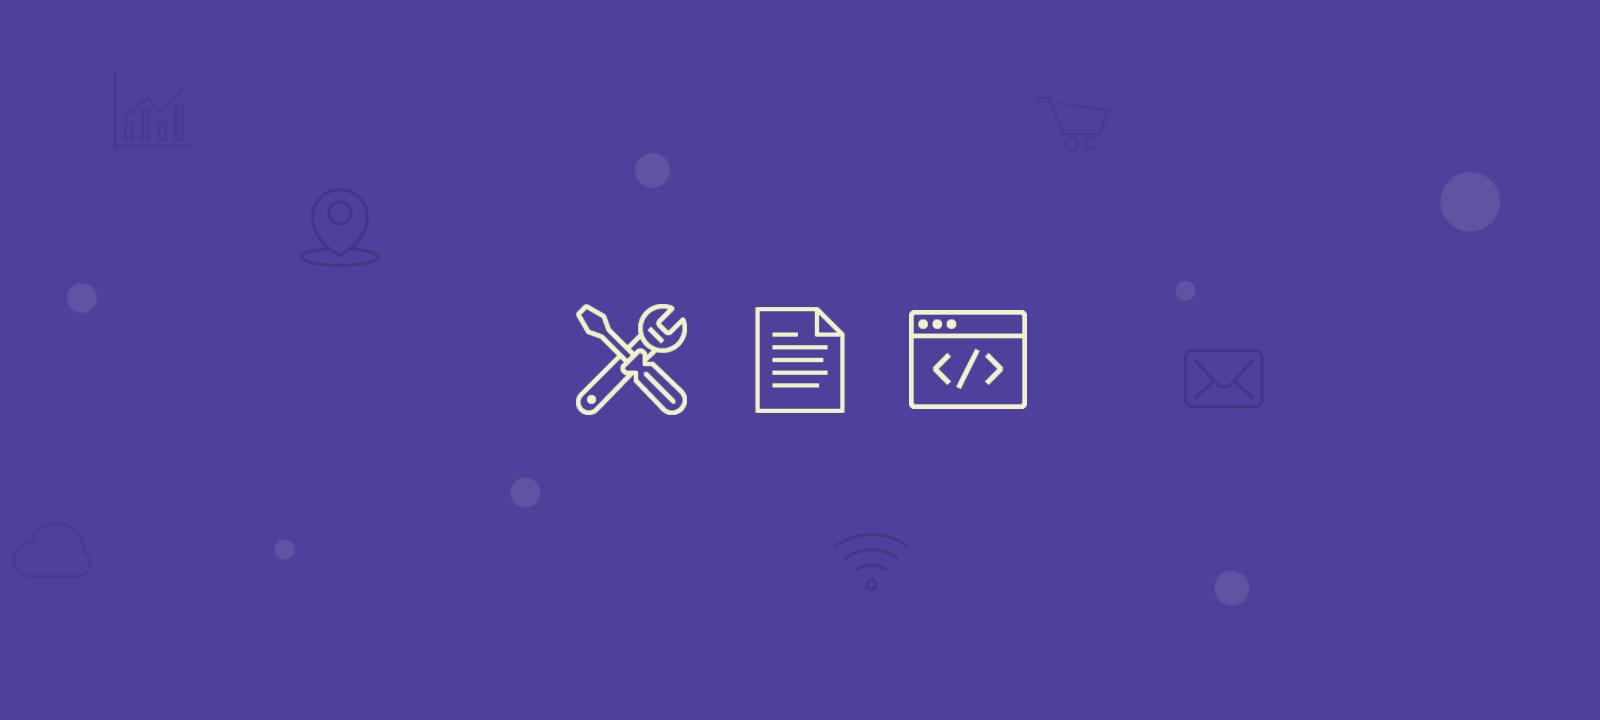 wordpress post get meta functions